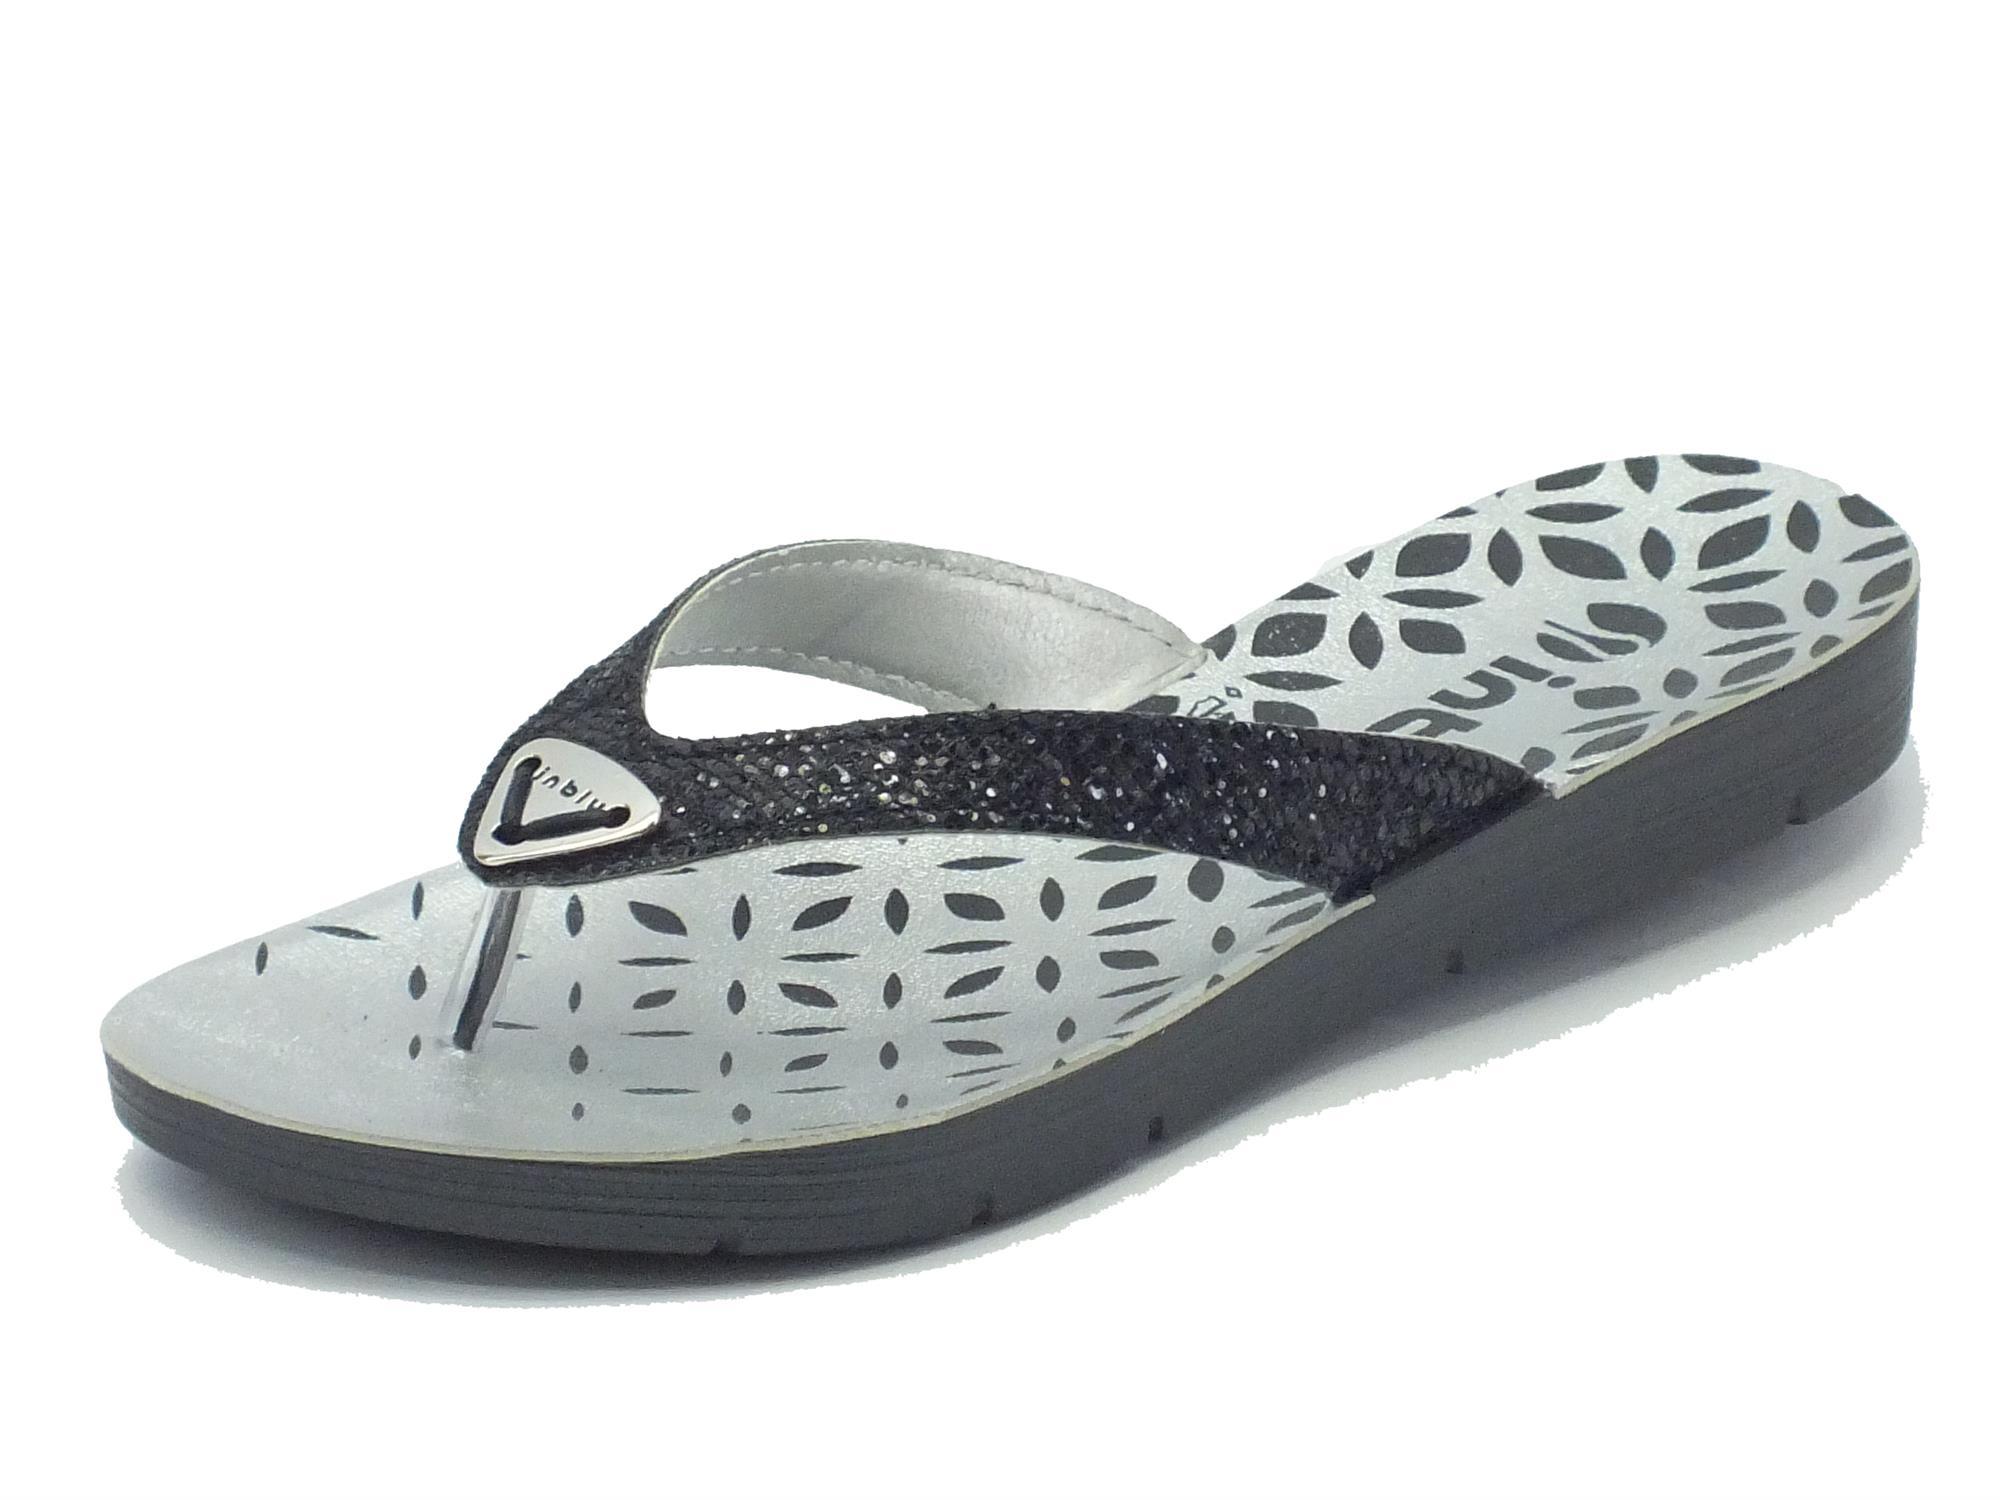 Calzature donna argentati amp; Primavera Inblu Accessori per qHBqO